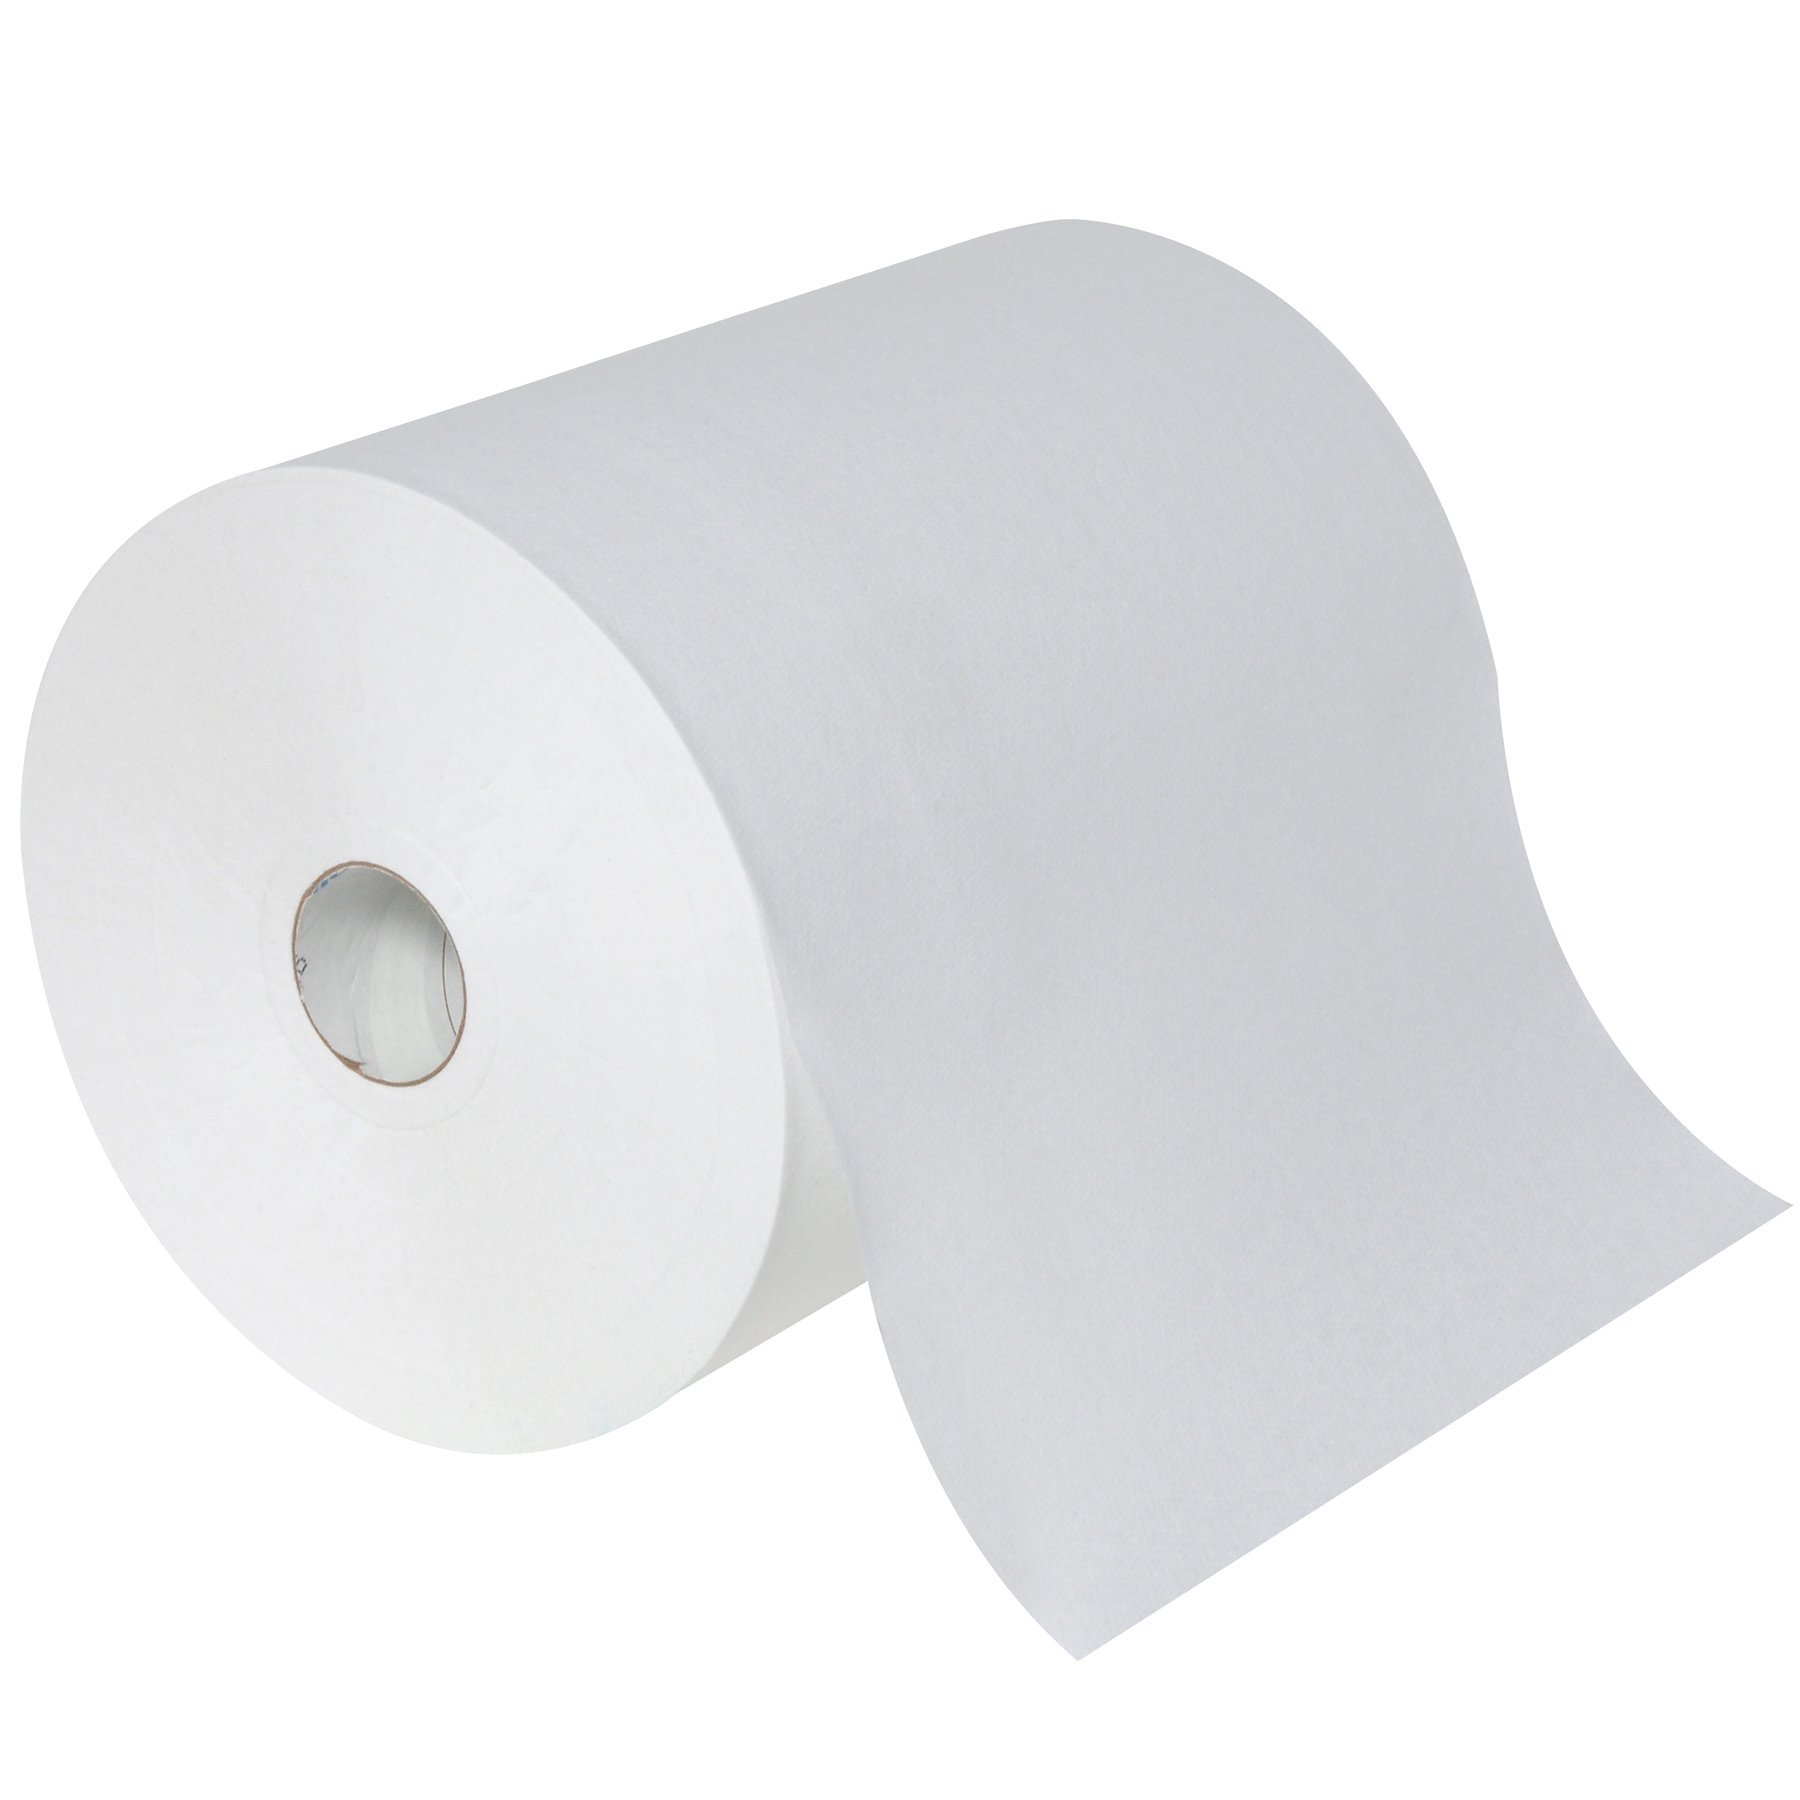 Kamenstein 5191872 Stainless Steel Perfect Tear Paper Towel Holder